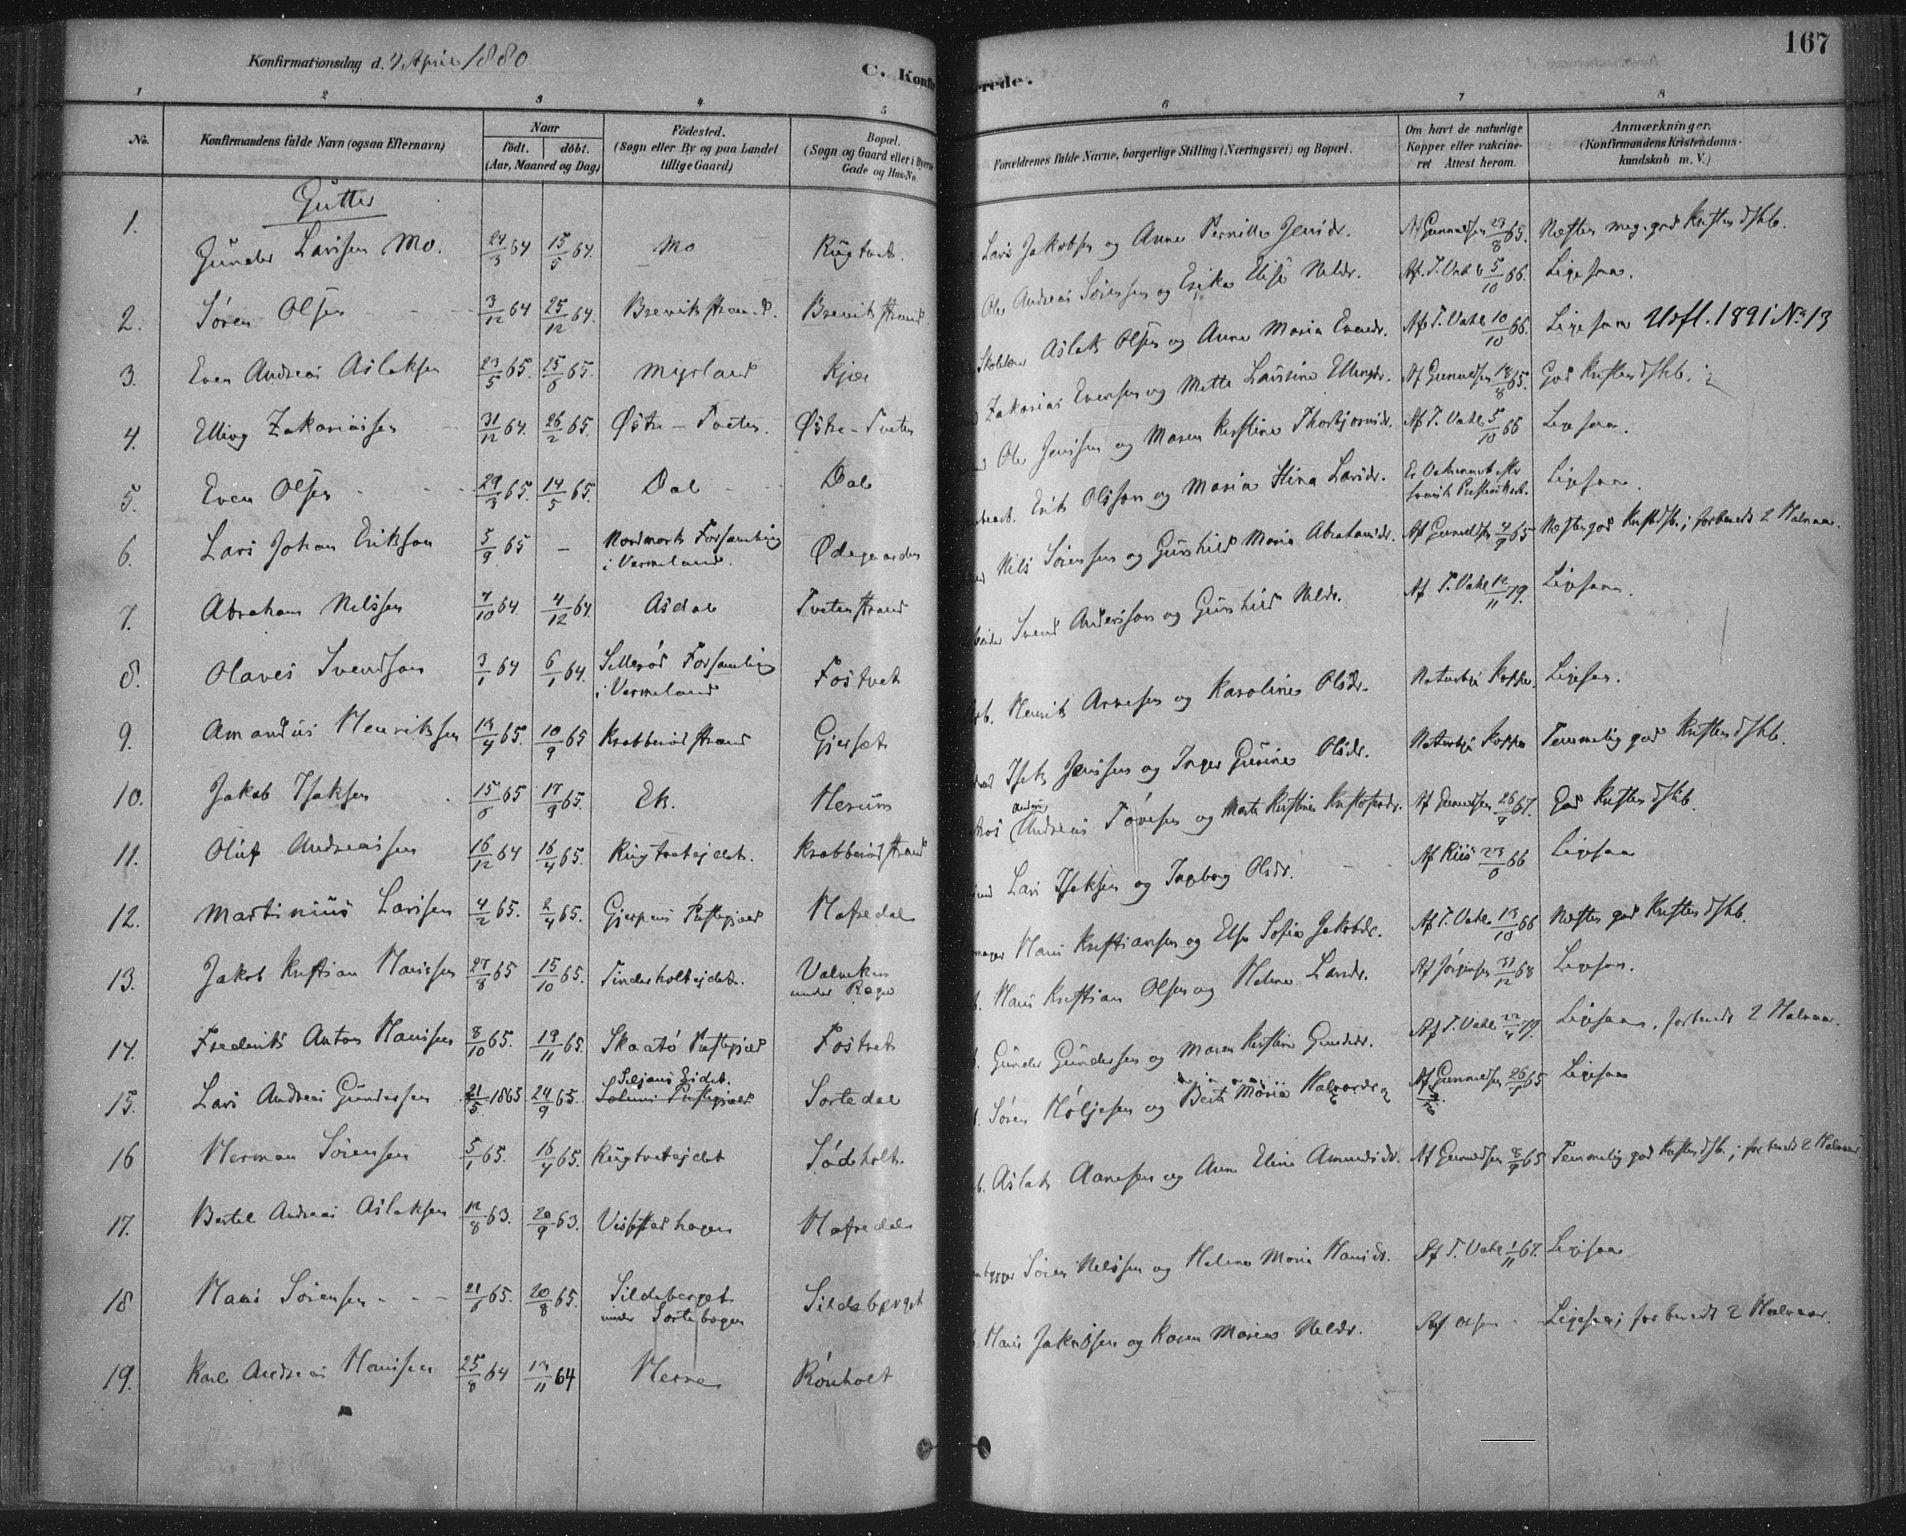 SAKO, Bamble kirkebøker, F/Fa/L0007: Ministerialbok nr. I 7, 1878-1888, s. 167